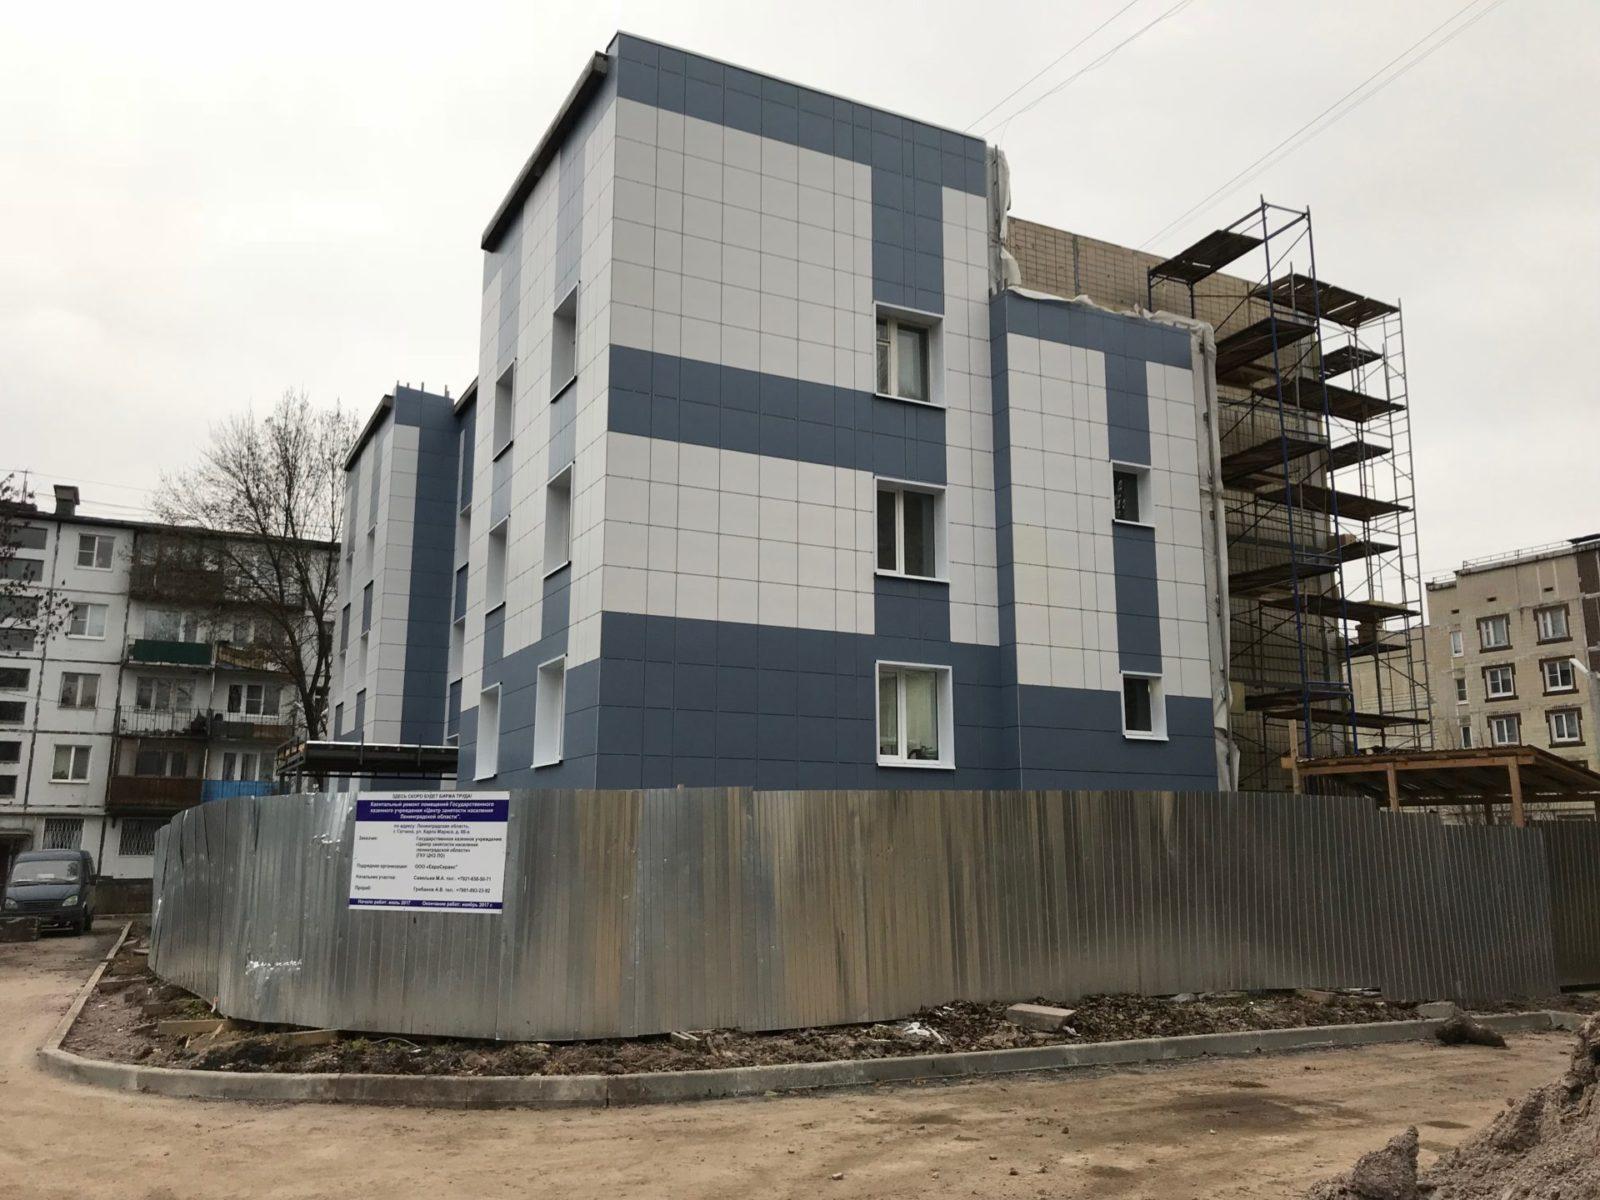 Оказание услуг по устройству вентилируемого фасада здания Центра занятости вг. Гатчина, Лен Области